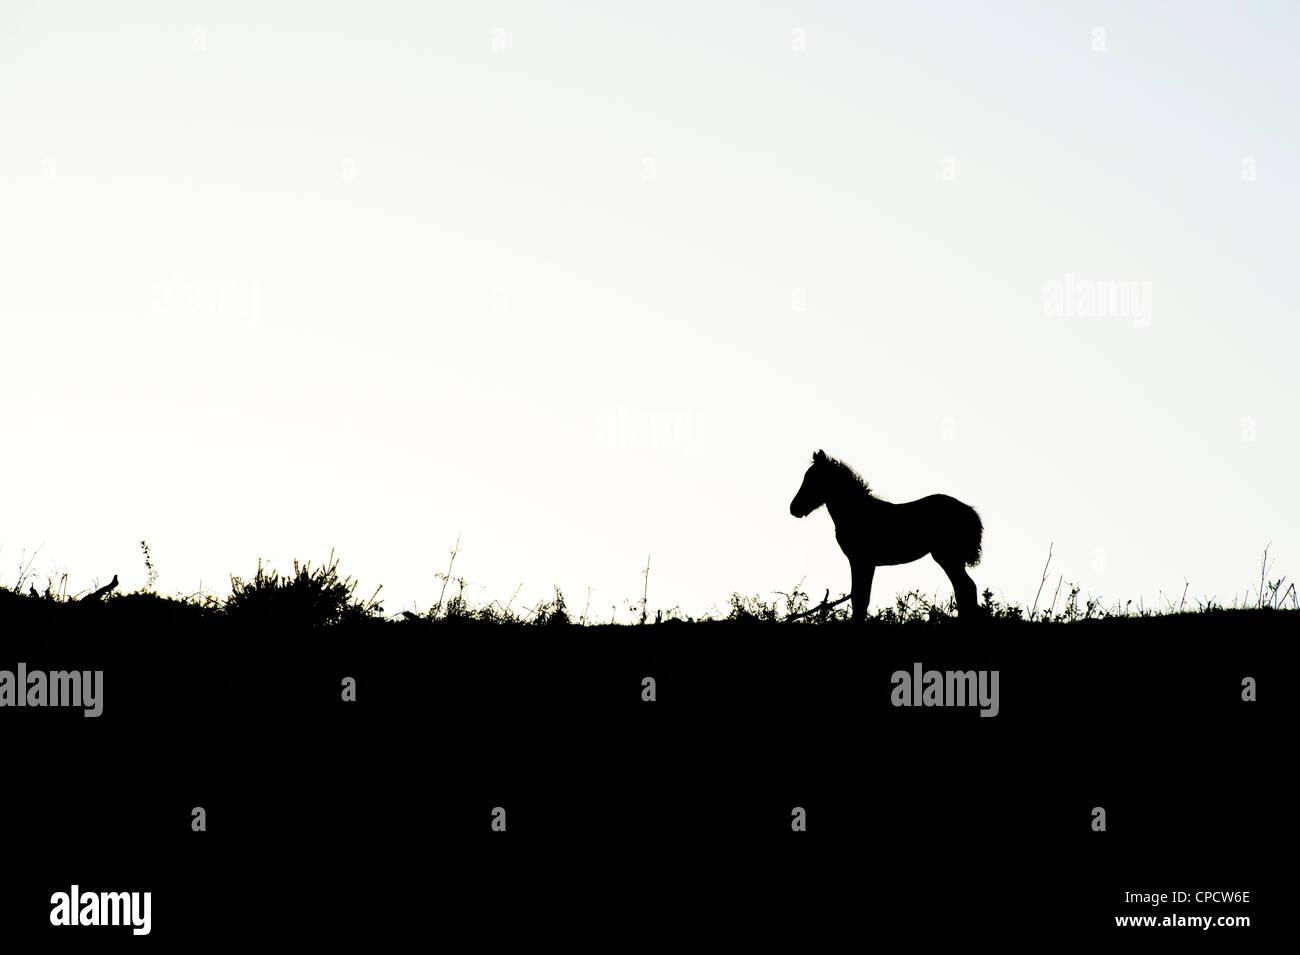 Dartmoor pony / foal silhouette . Dartmoor national park, Devon, England - Stock Image